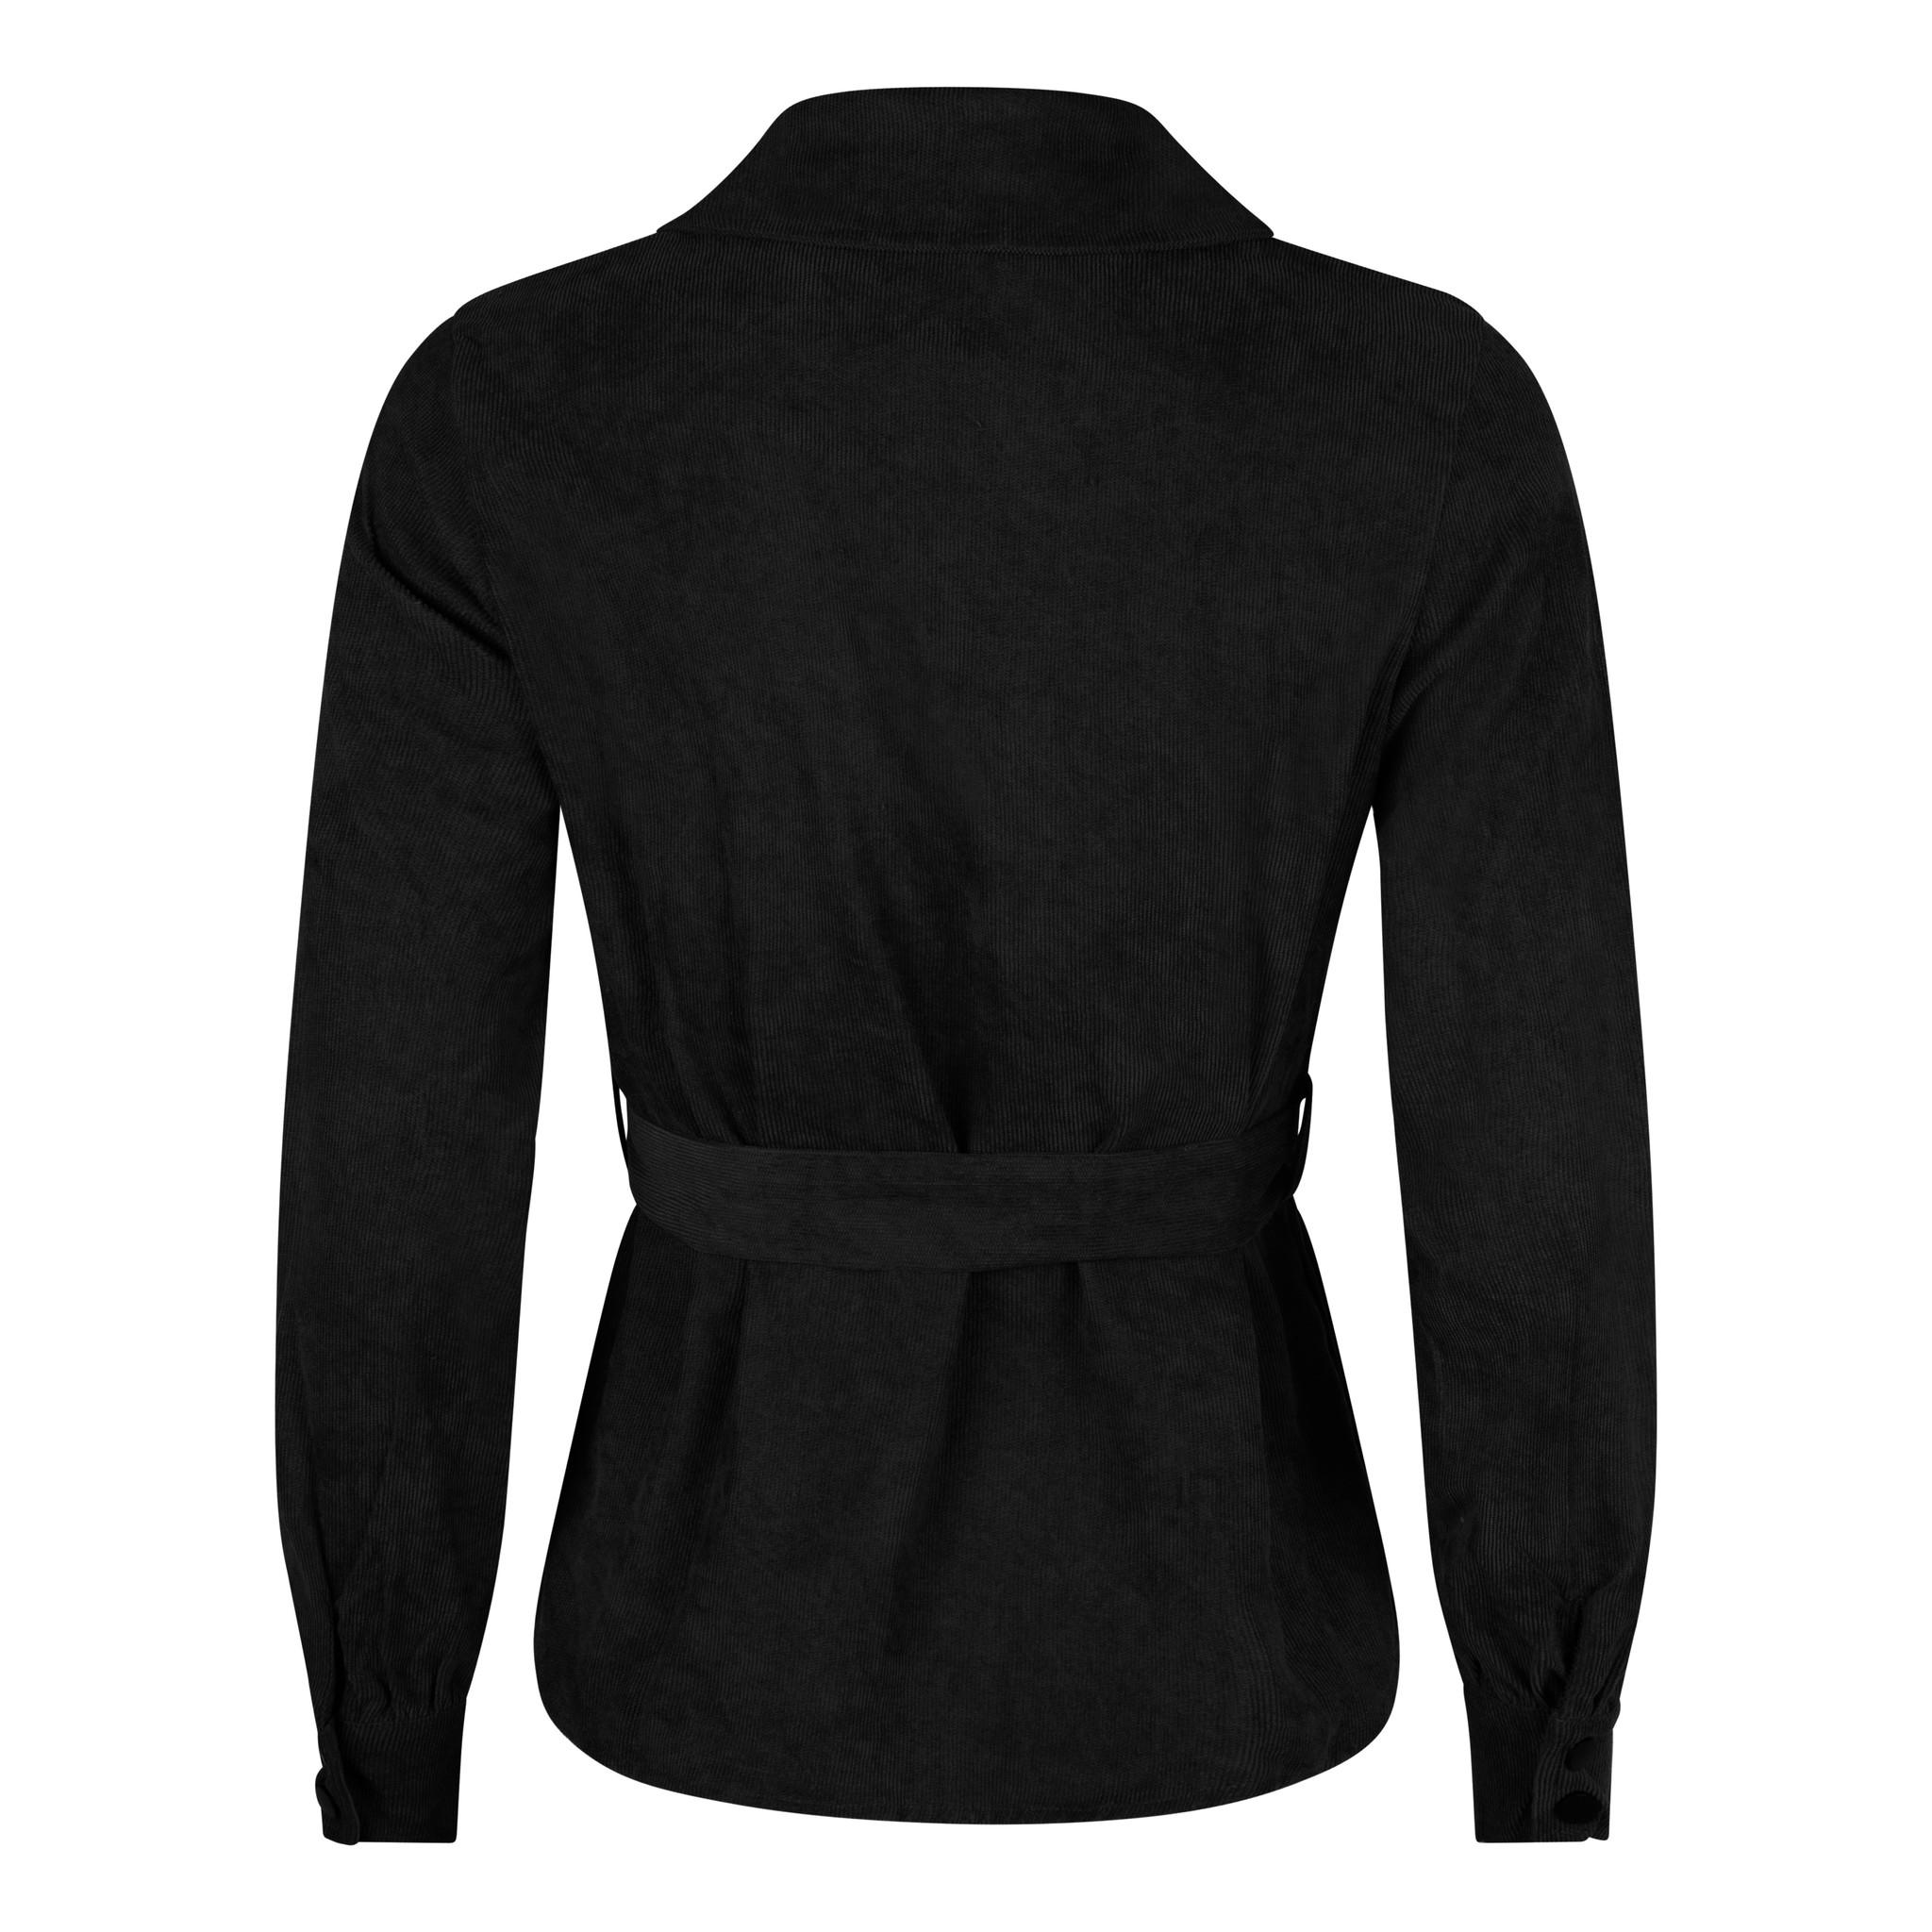 Lofty Manner Zwarte Top Julia